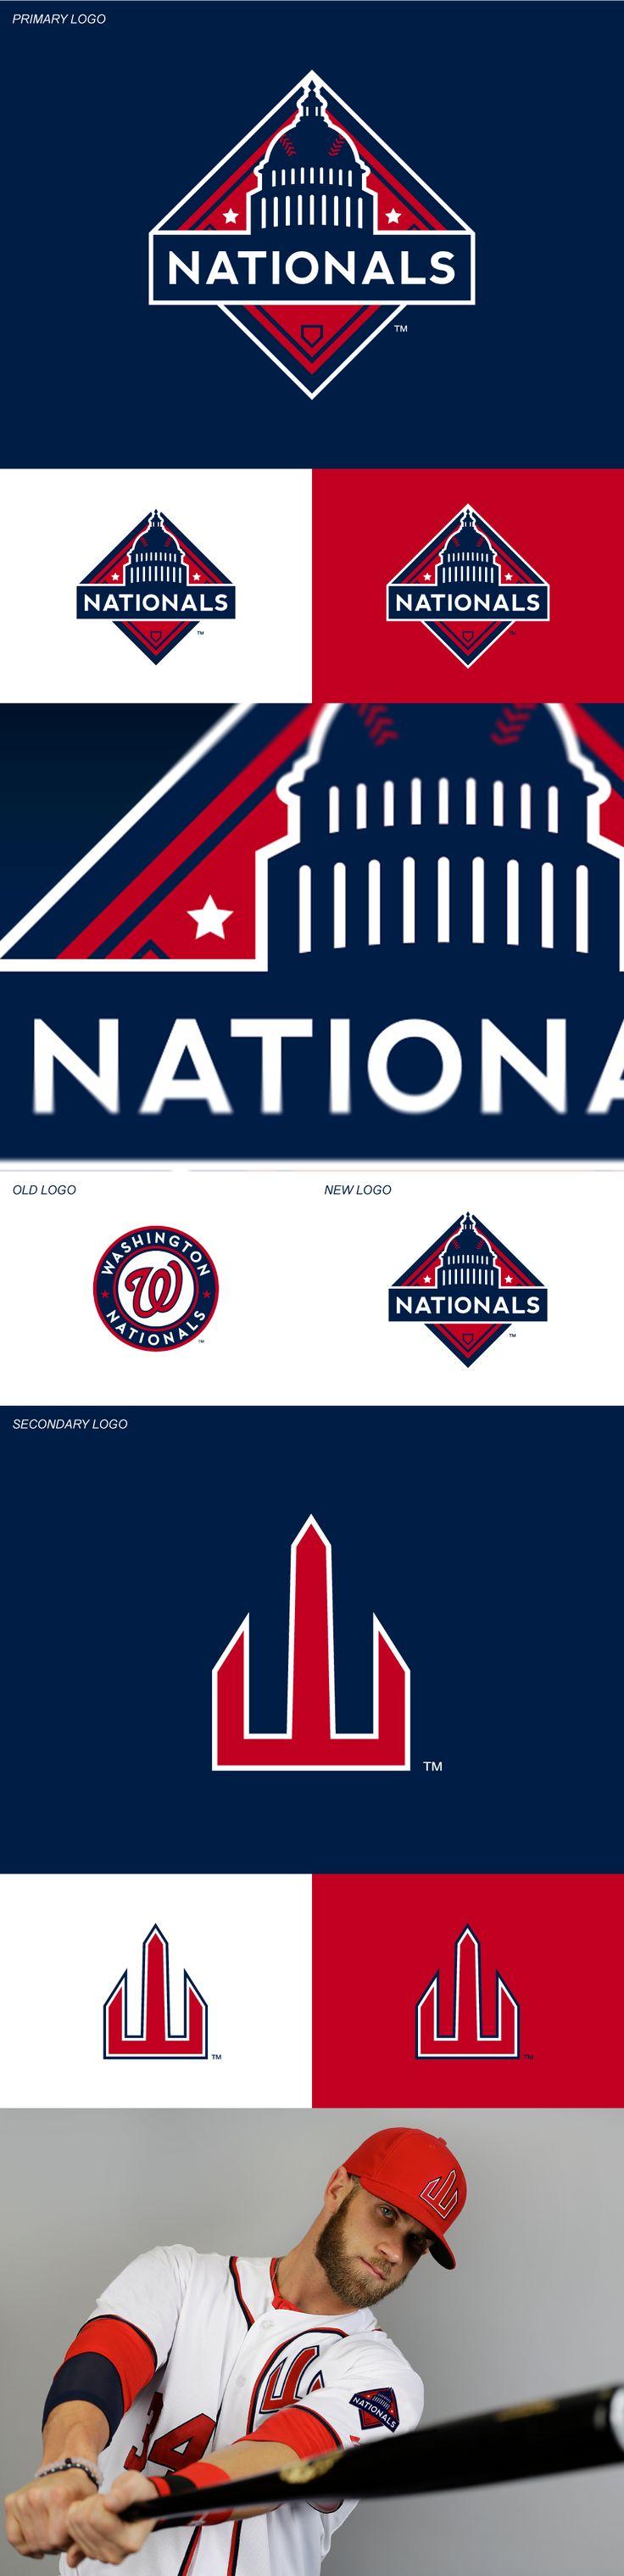 Washington Nationals Rebrand Concept on Behance Baseball